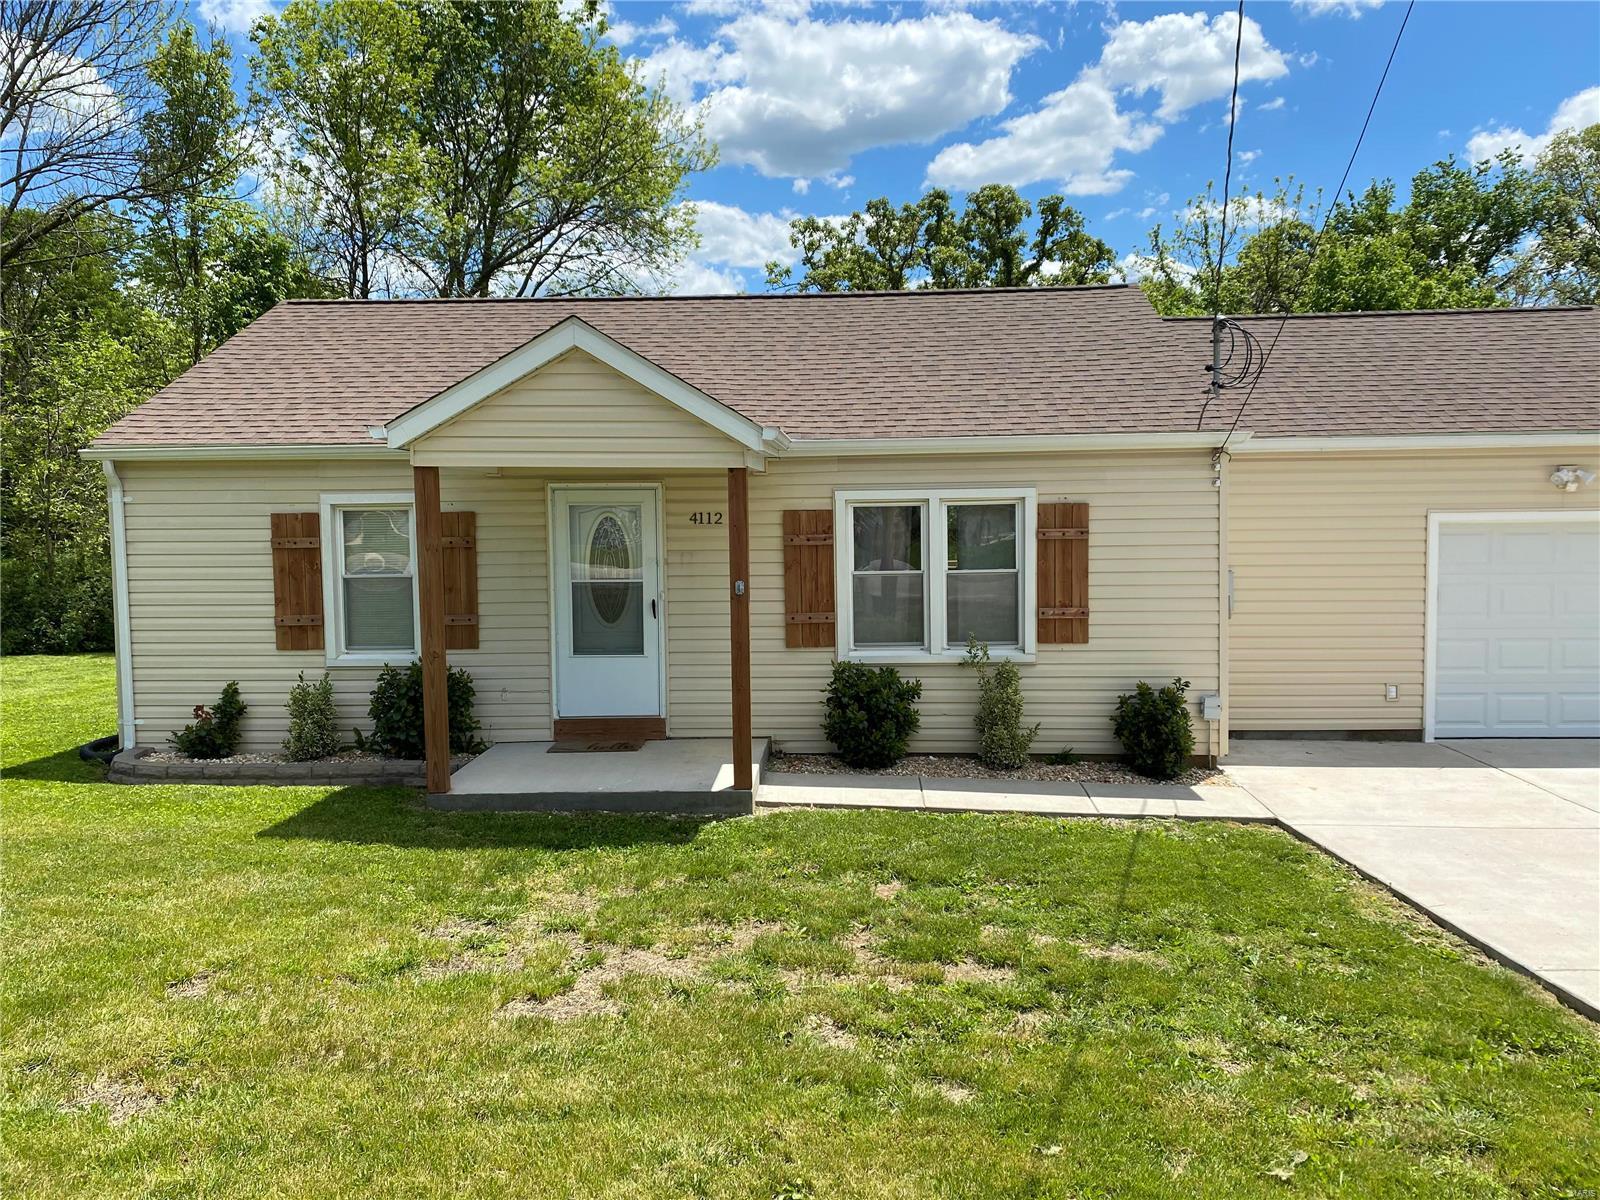 4112 Upper Plattin Property Photo - De Soto, MO real estate listing